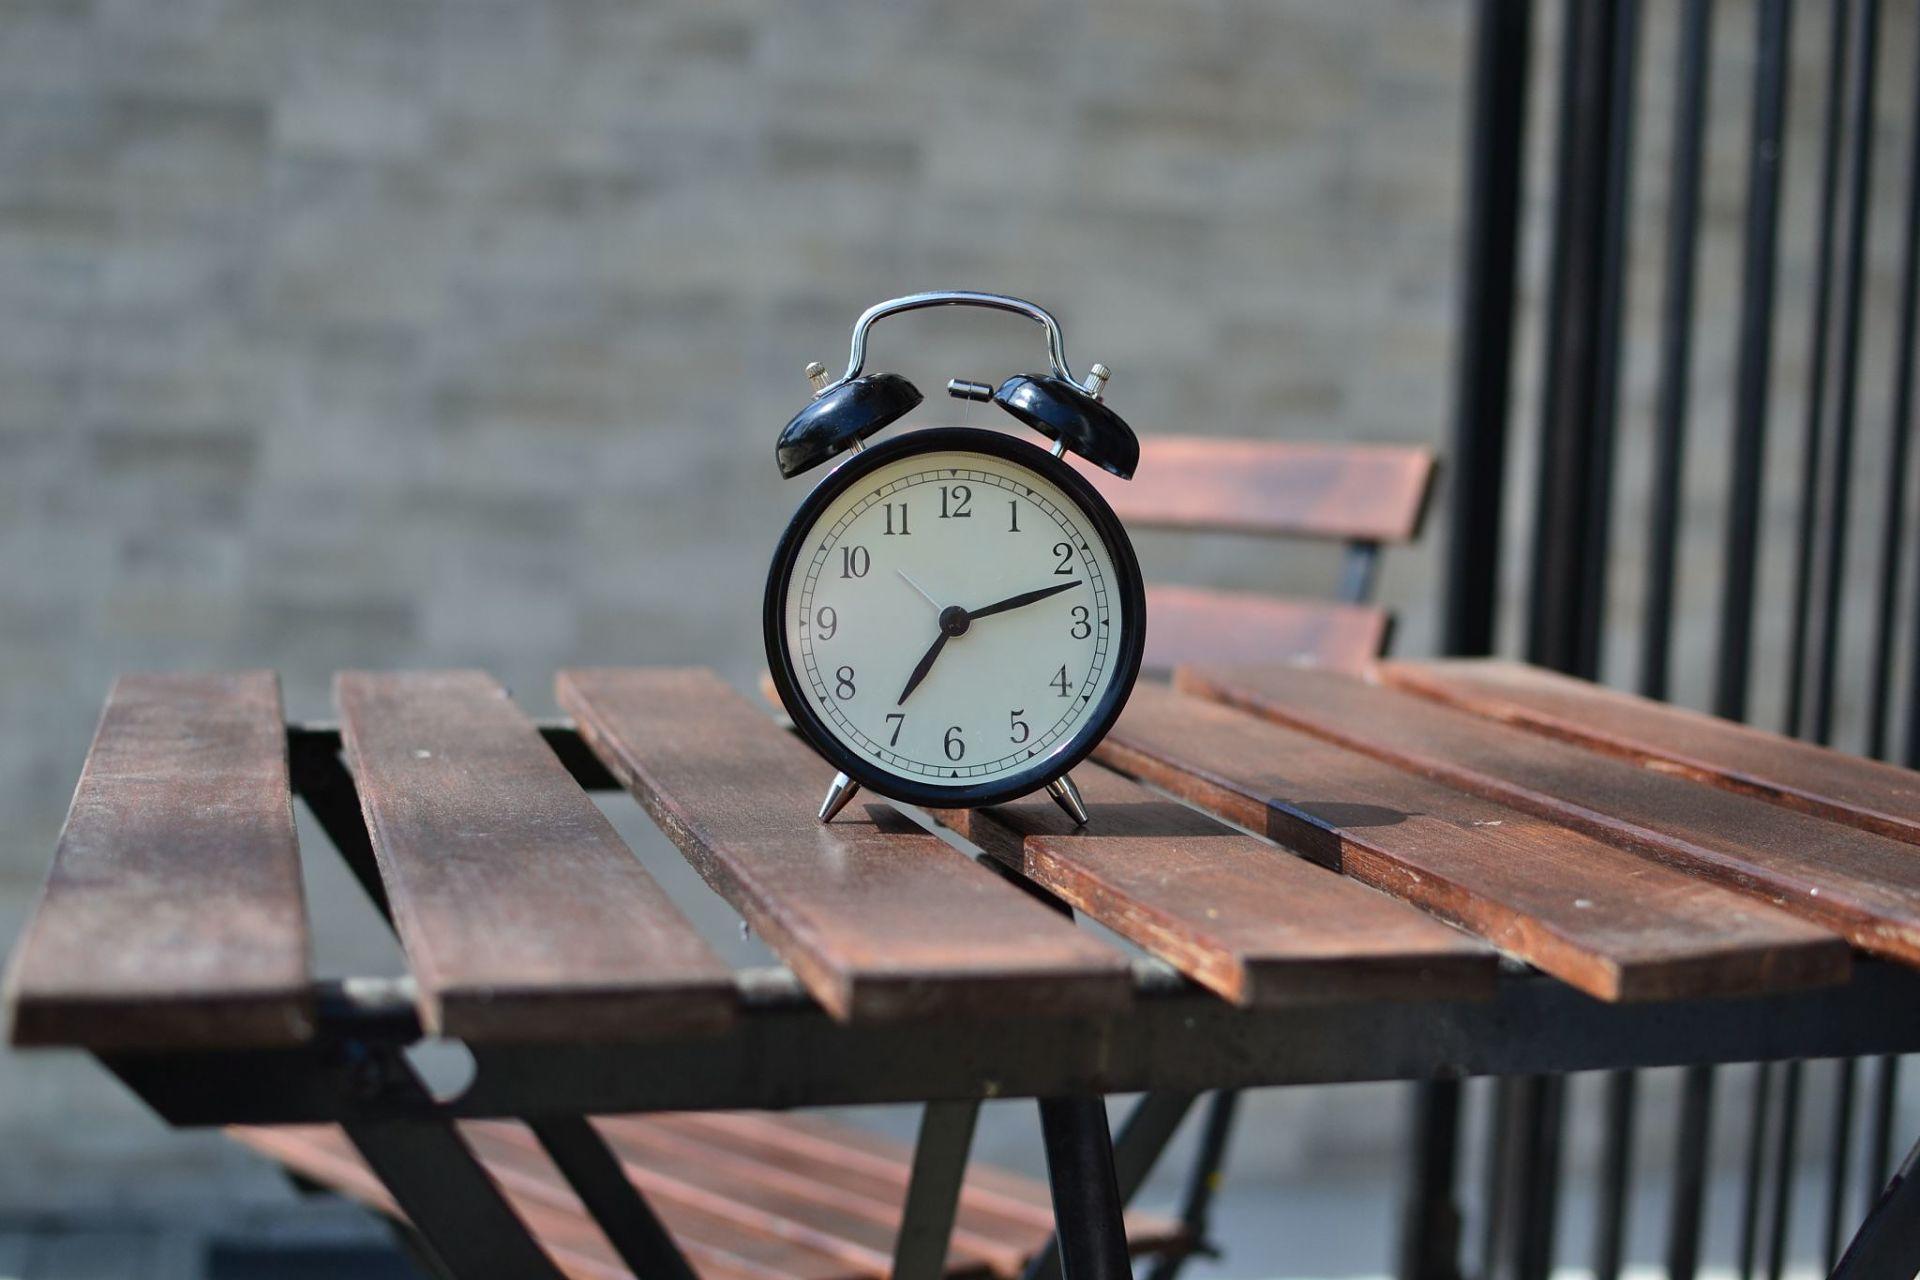 TEA 1/3: Pametno upravljaj svojim vremenom